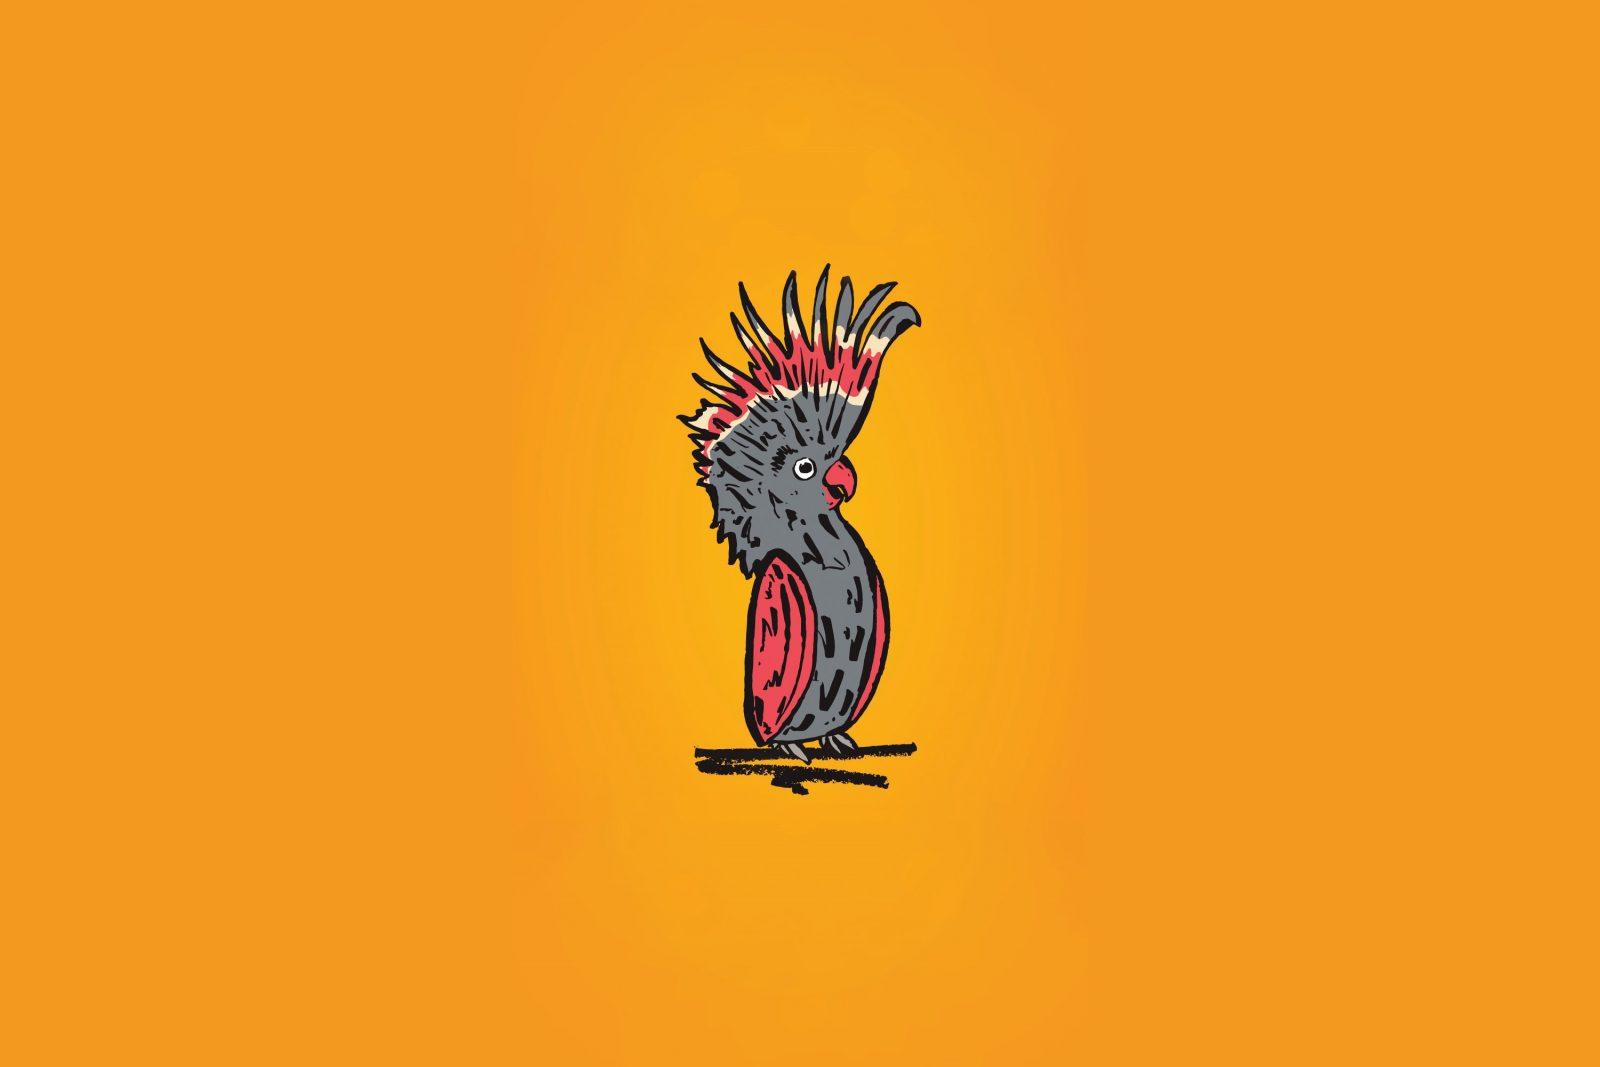 cockatoo on orange background